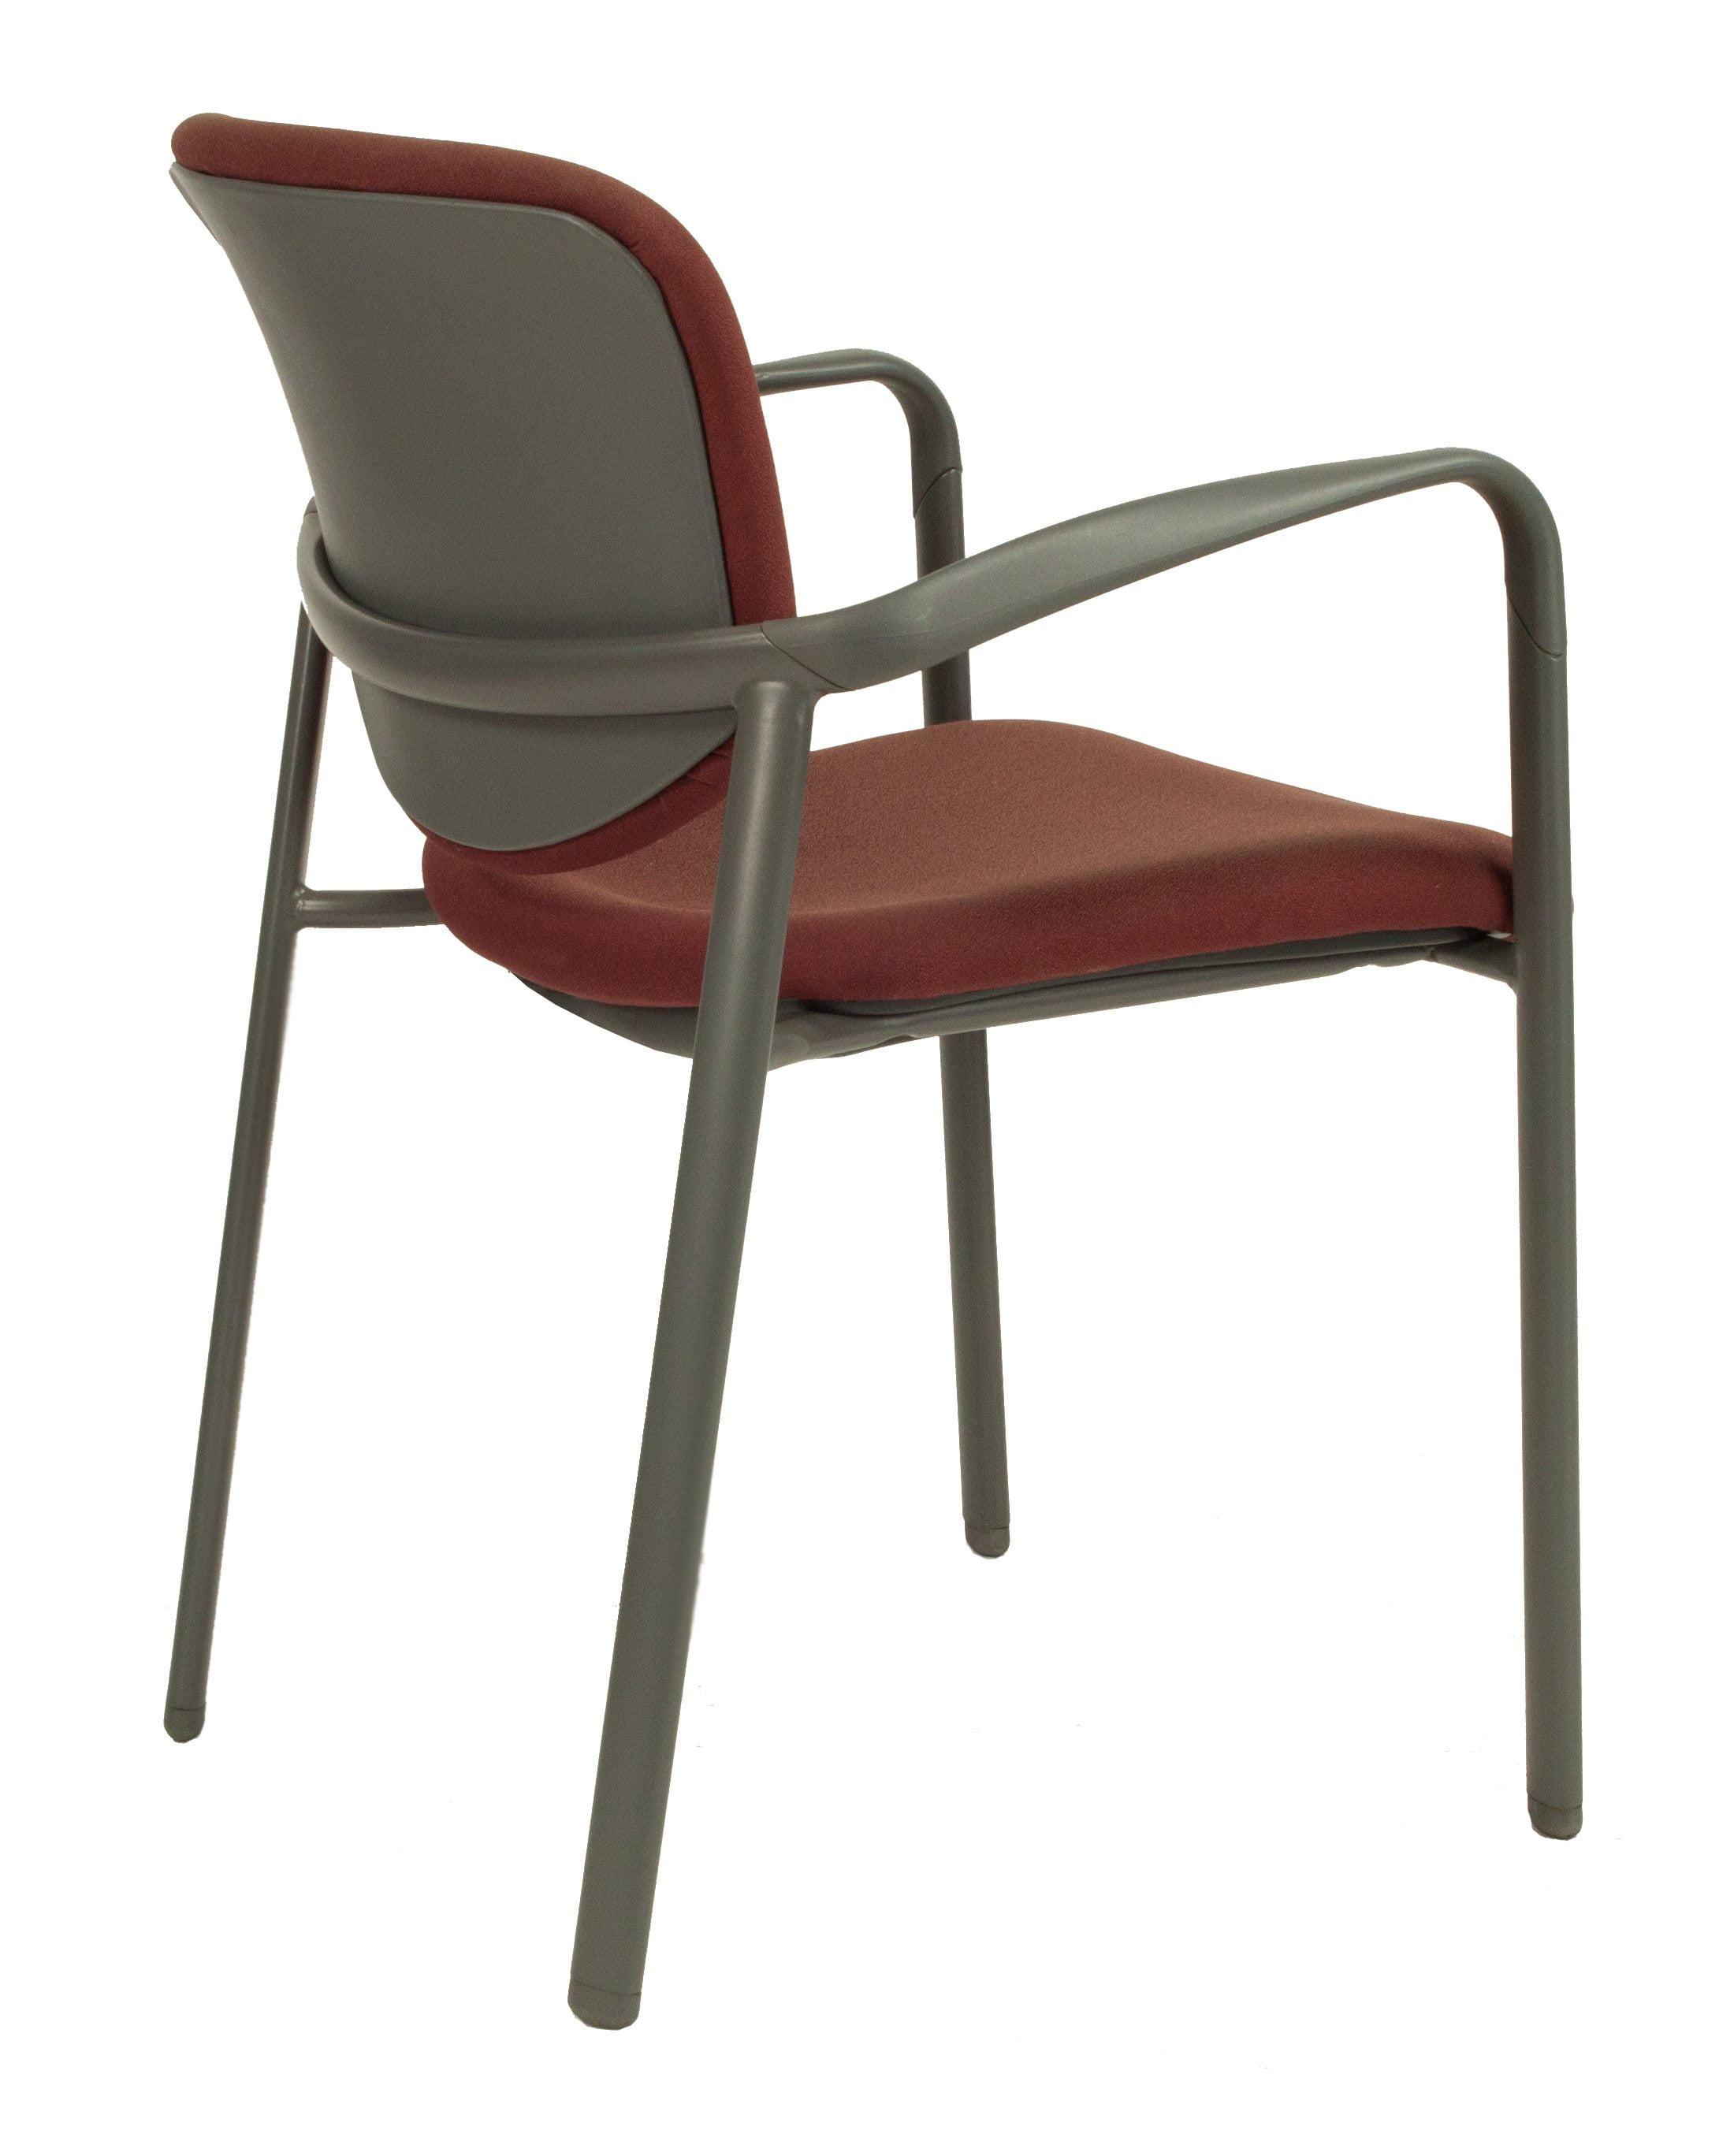 Haworth Improv Used Stack Chair Rust